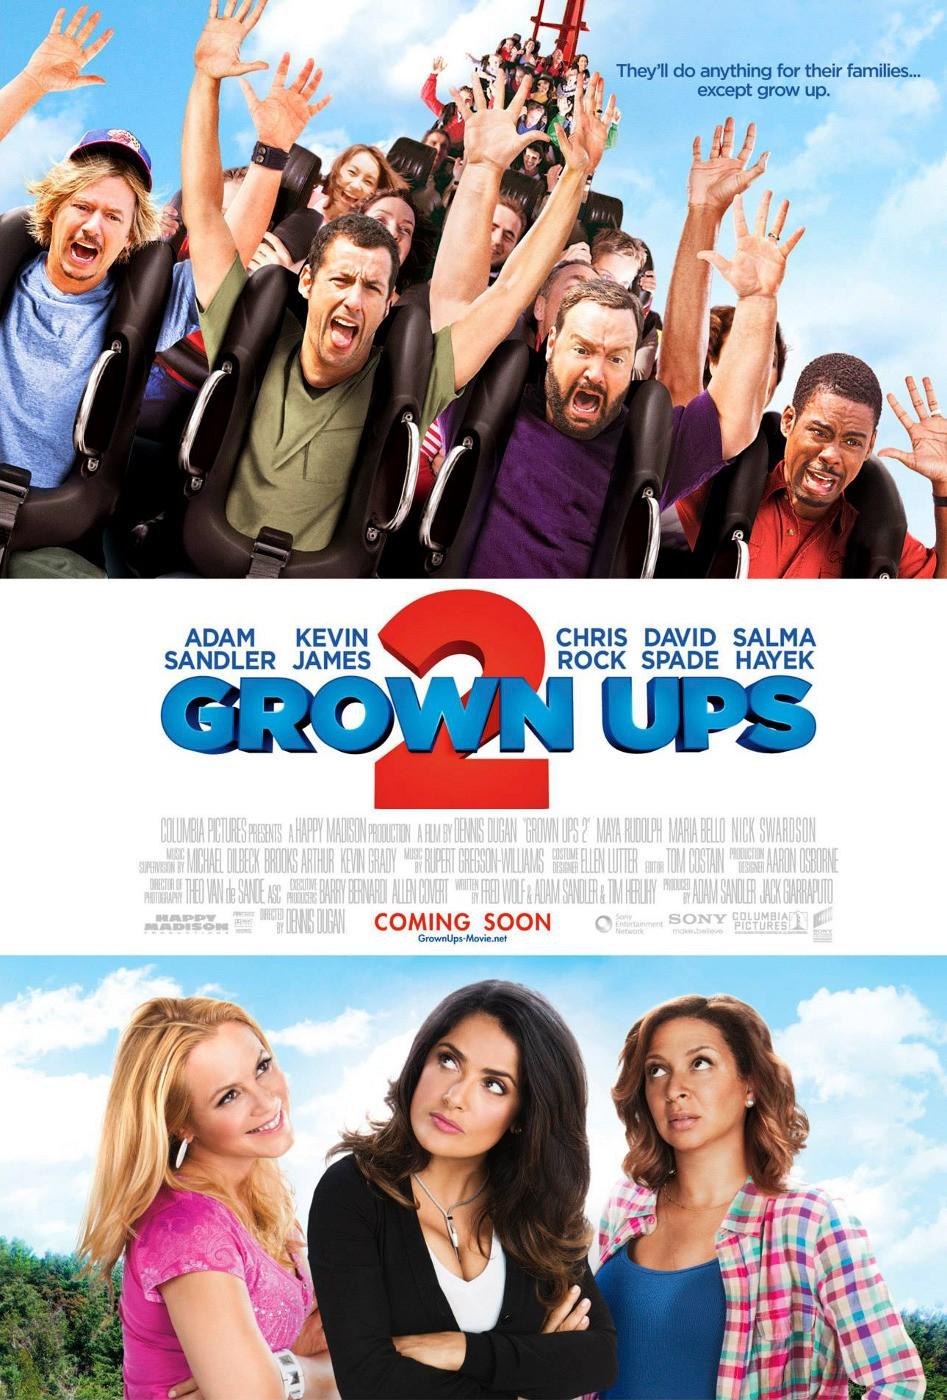 Grown Ups 2 (2013) | Scratchpad | FANDOM powered by Wikia